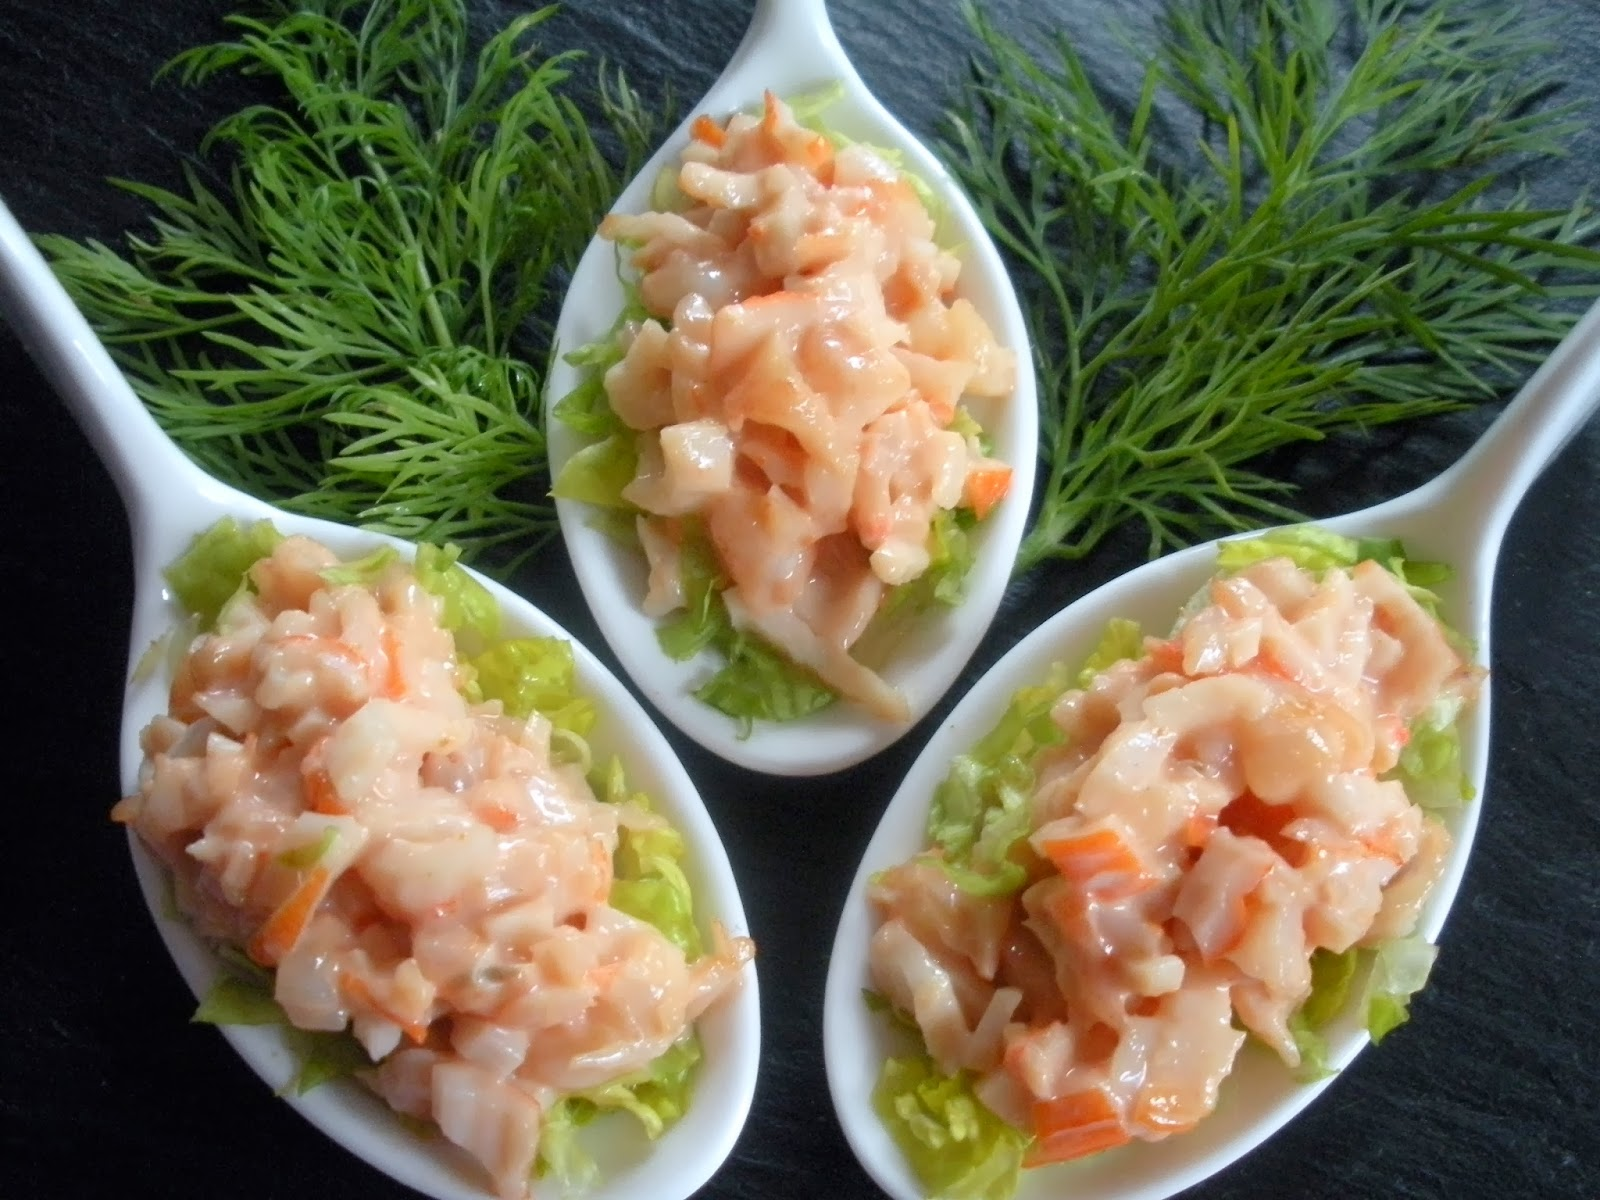 Aqu se cocina cucharitas de aperitivo - Aperitivos de mariscos ...